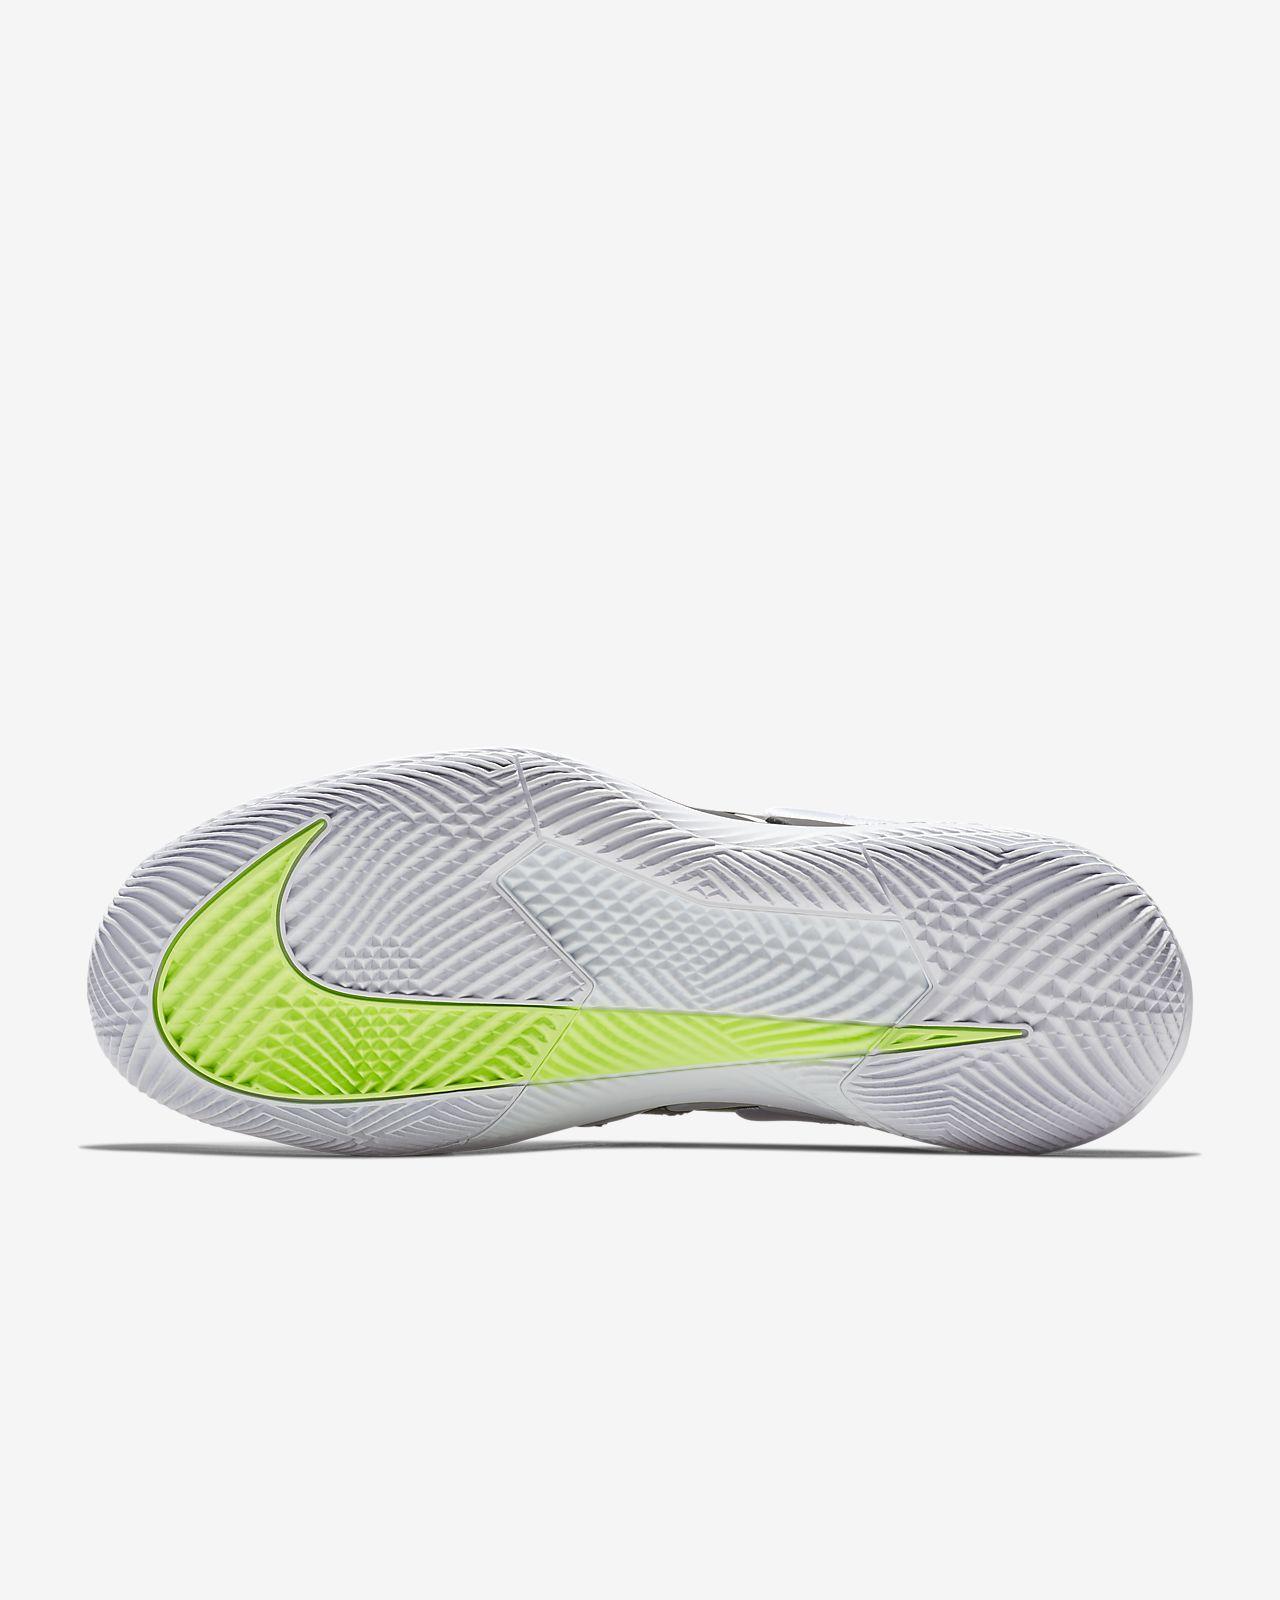 ed210536a251 NikeCourt Air Zoom Vapor X Premium Hard-Court Men s Tennis Shoe ...